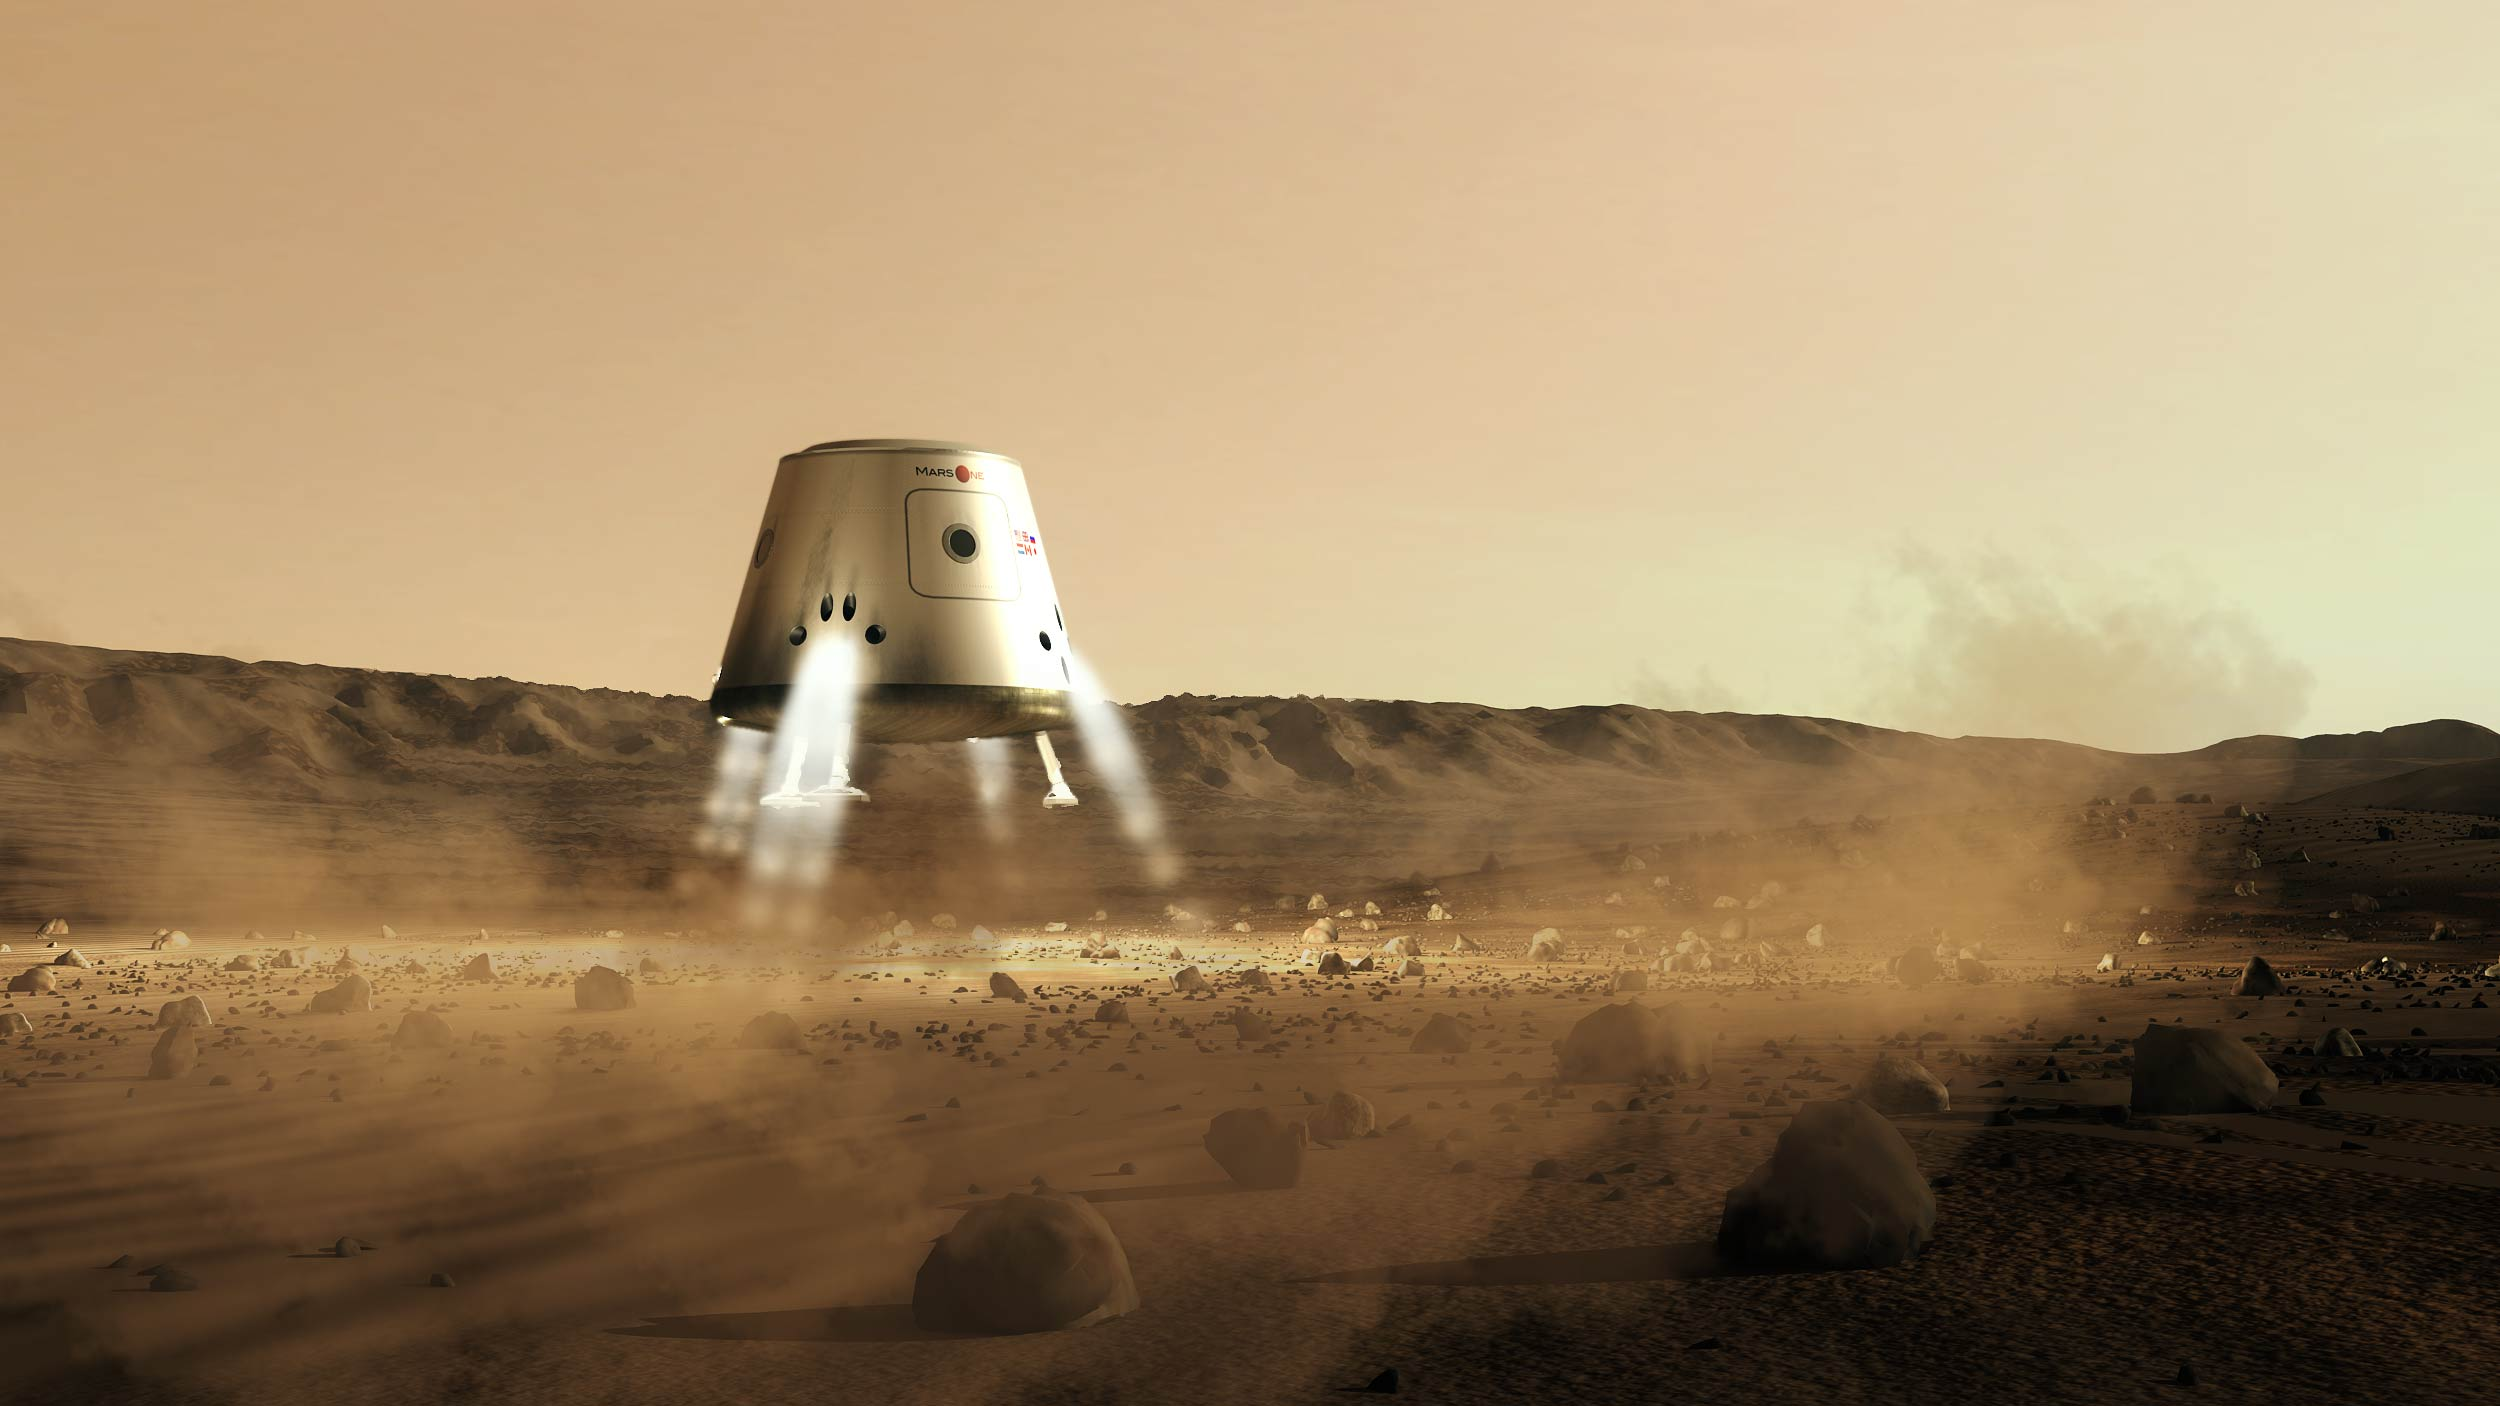 mars one astronaut applicants - photo #9